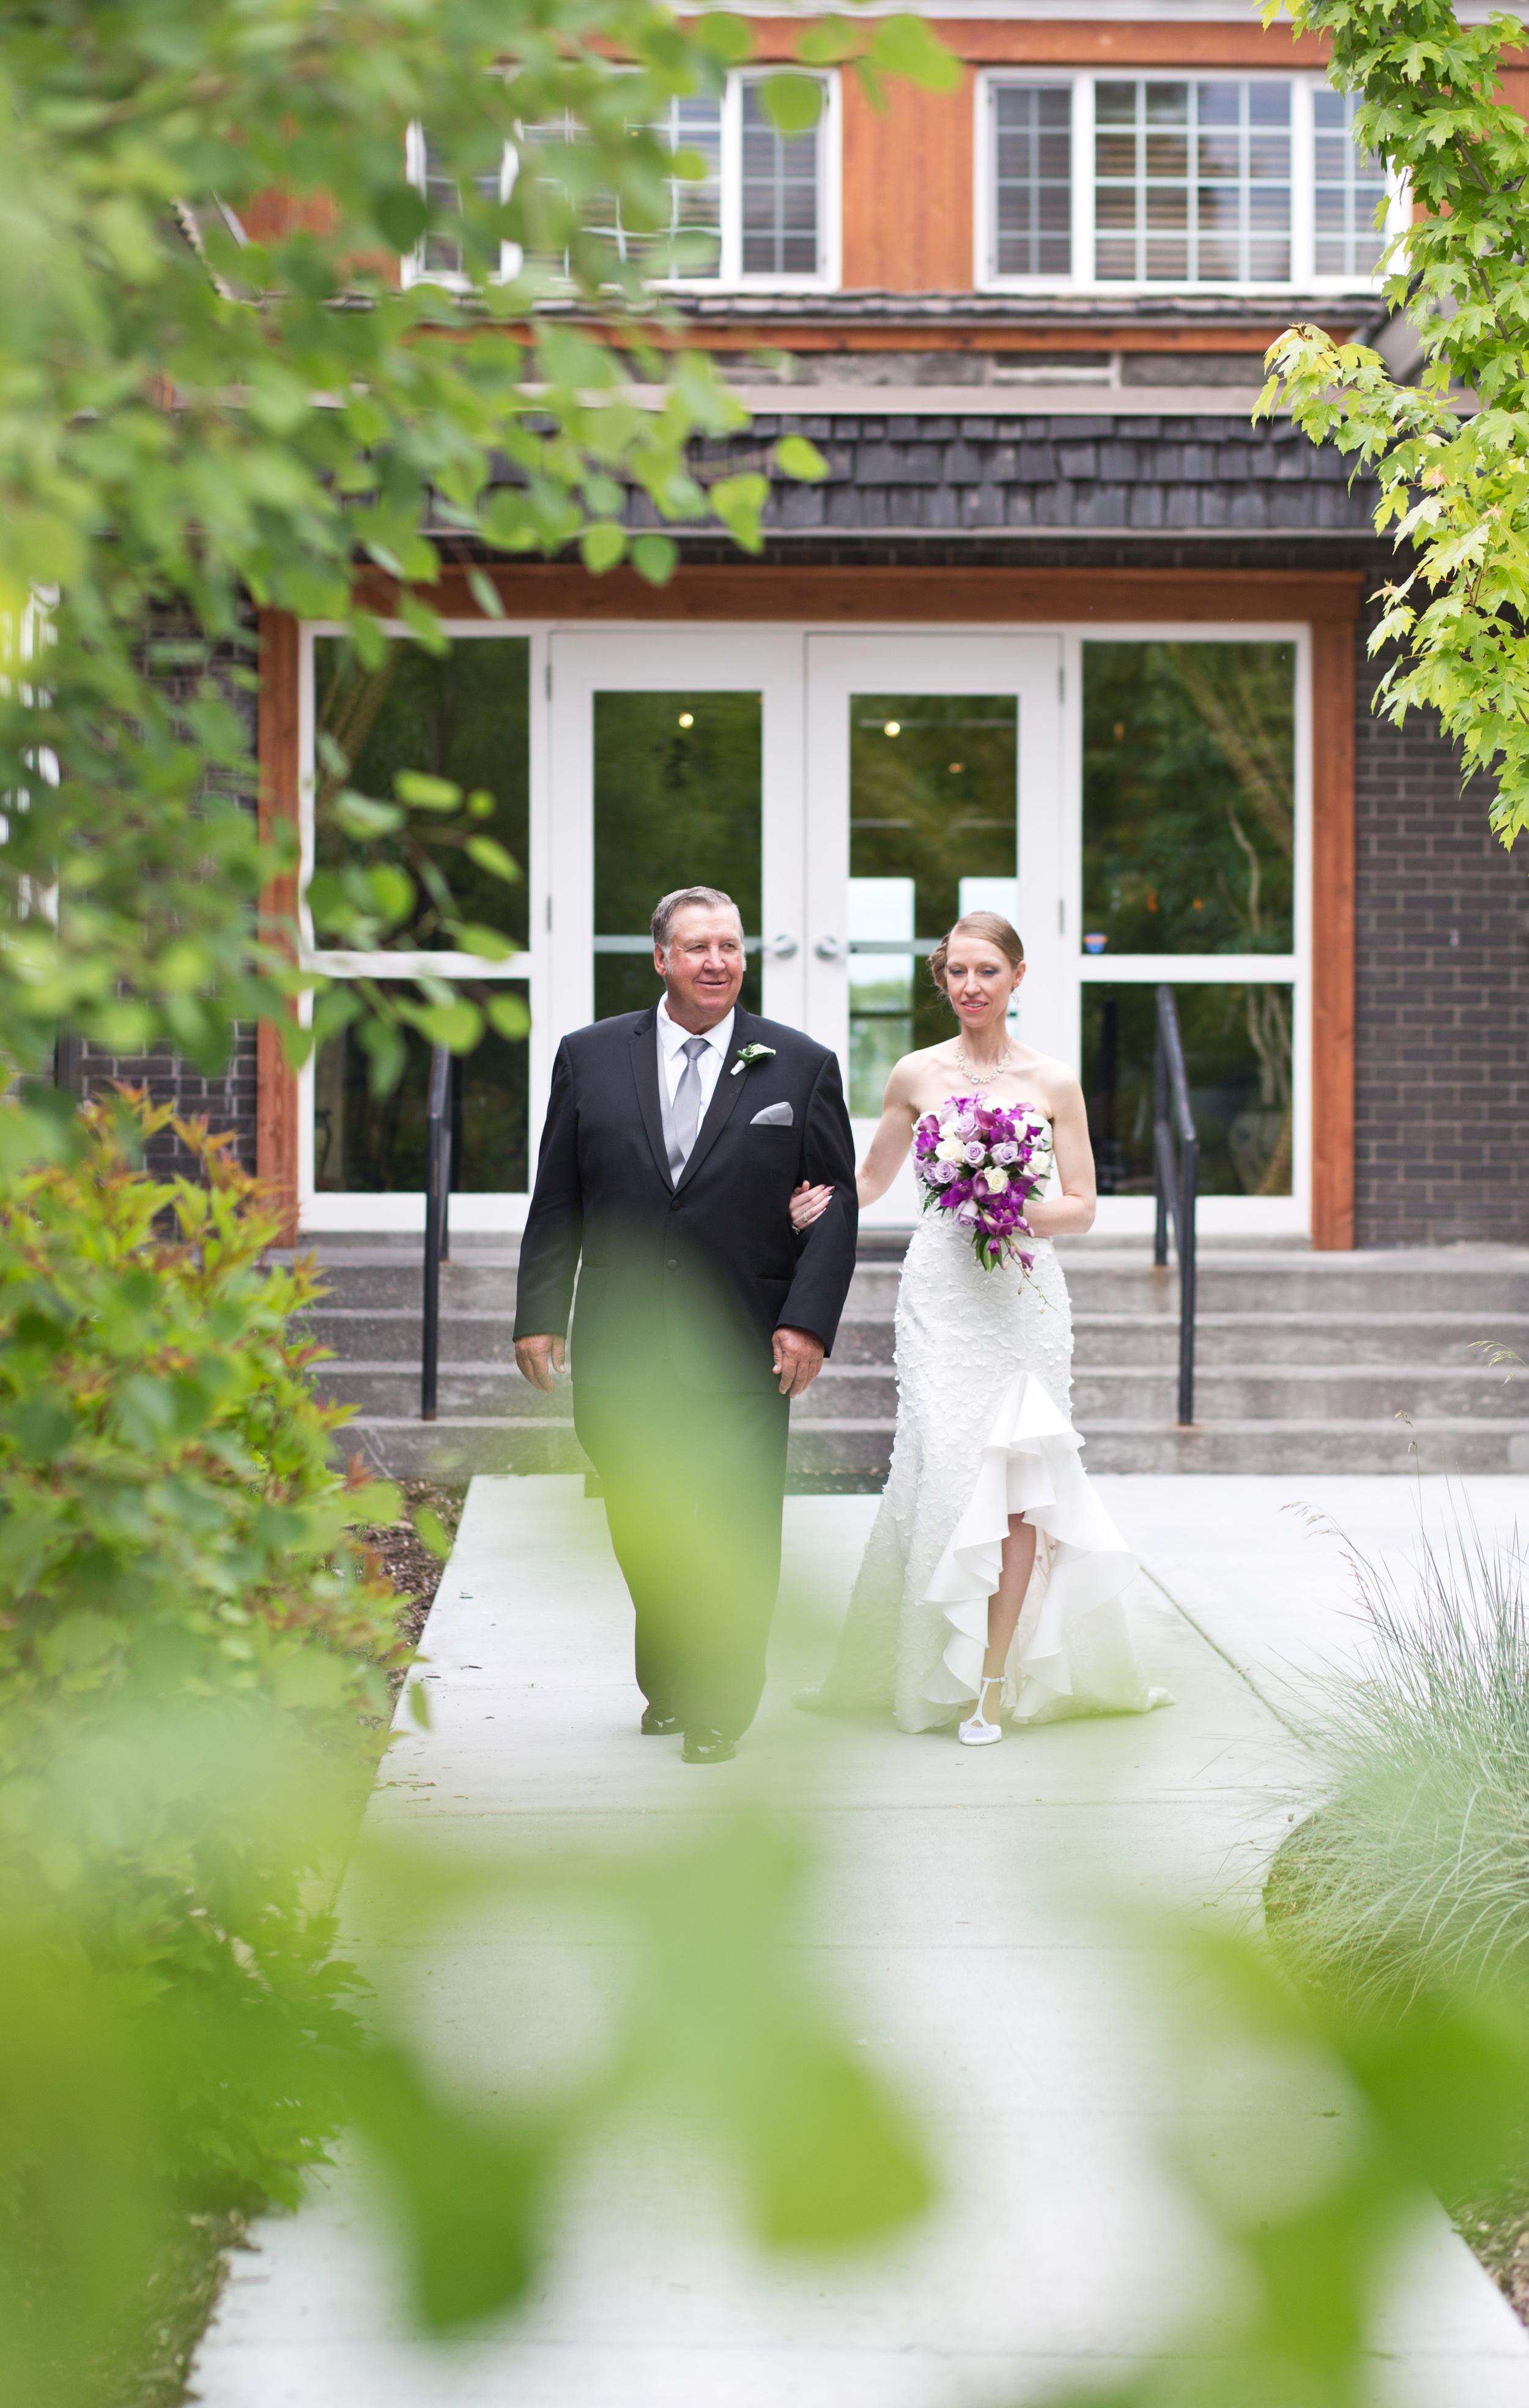 OVERTON WEDDING 2.JPG